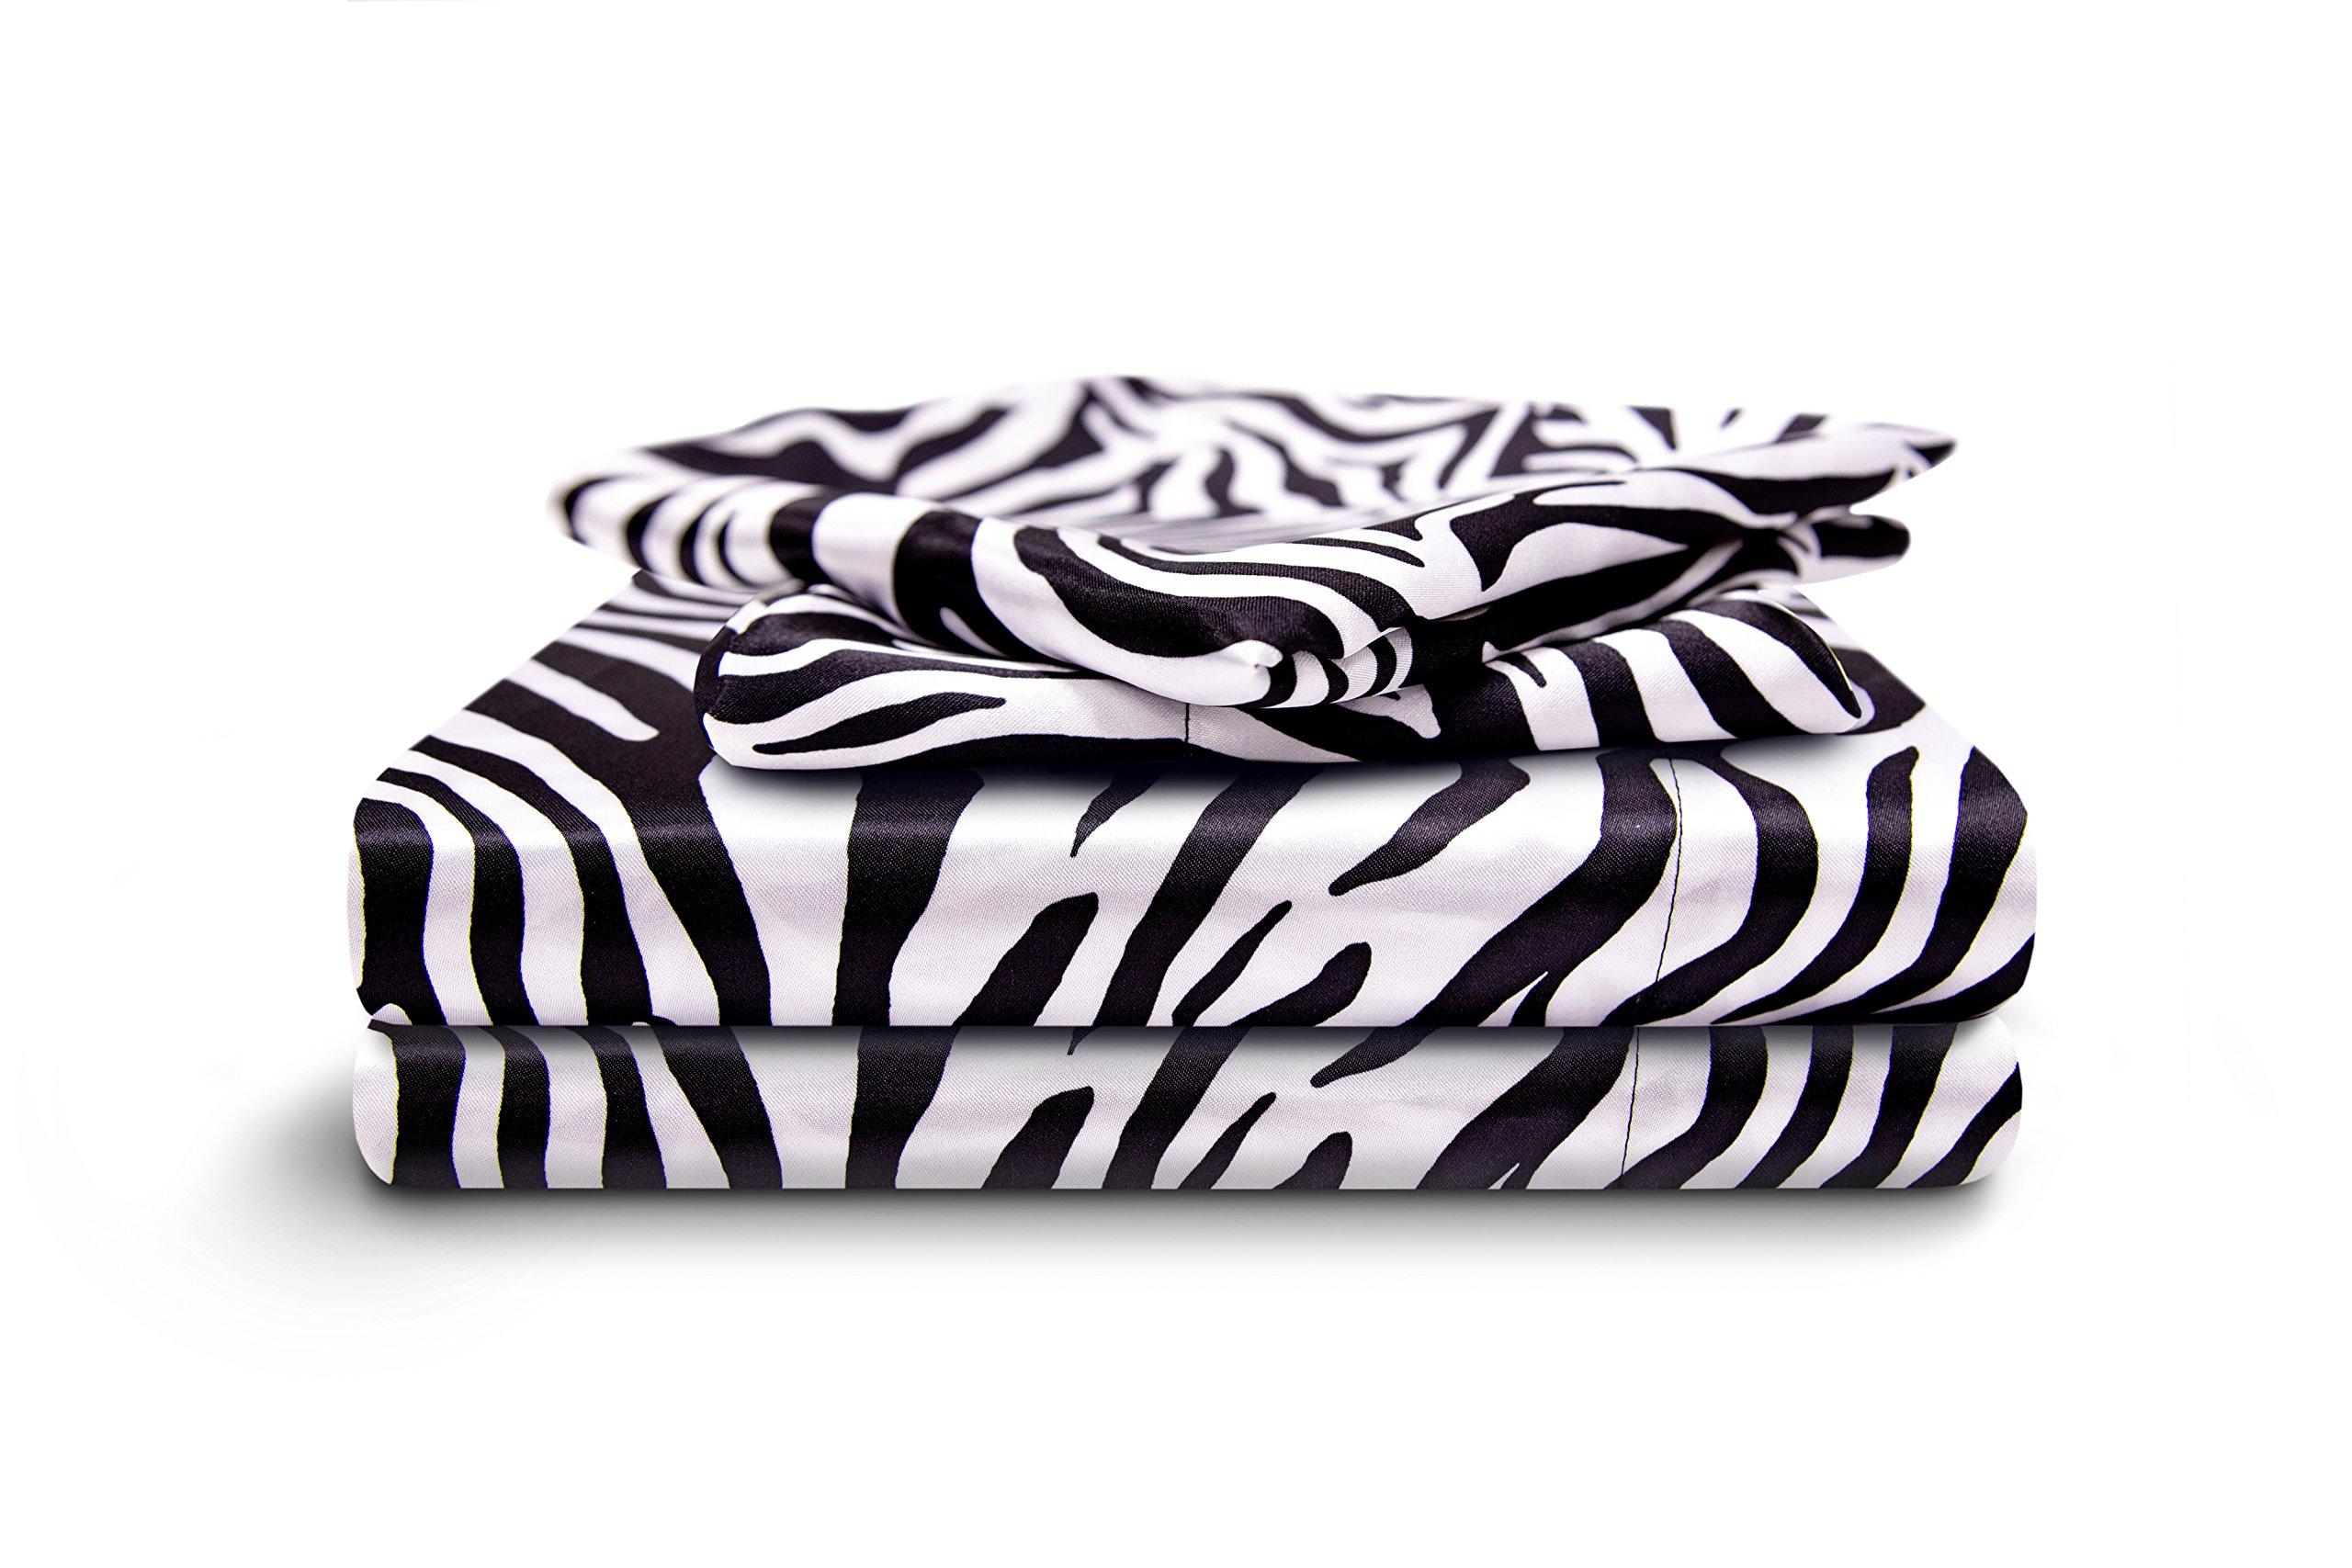 HONEYMOON HOME FASHIONS Queen Sheet Set Luxury Silkily Like Satin Bed Sheets, Zebra by HONEYMOON HOME FASHIONS (Image #1)